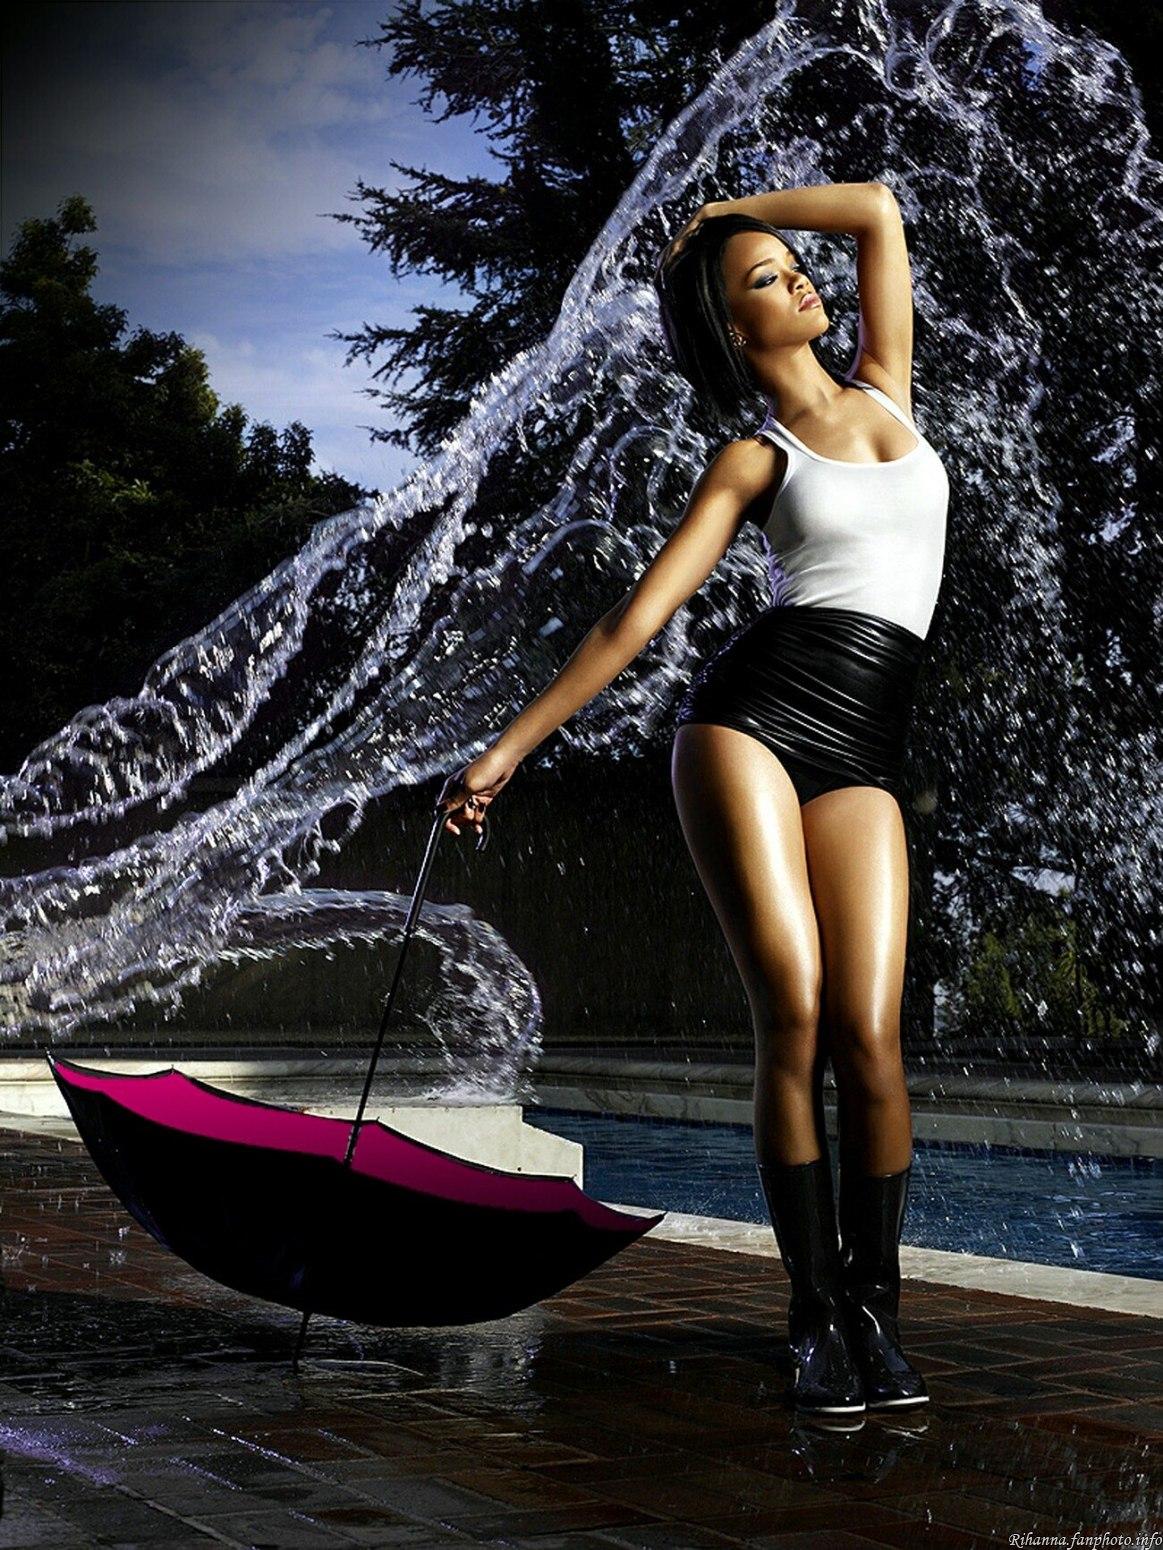 http://1.bp.blogspot.com/__v-CFM8Ta4M/TNYn799pNtI/AAAAAAAAATk/EeTEZGV9WFw/s1600/rihanna_umbrella_poster_001.jpg